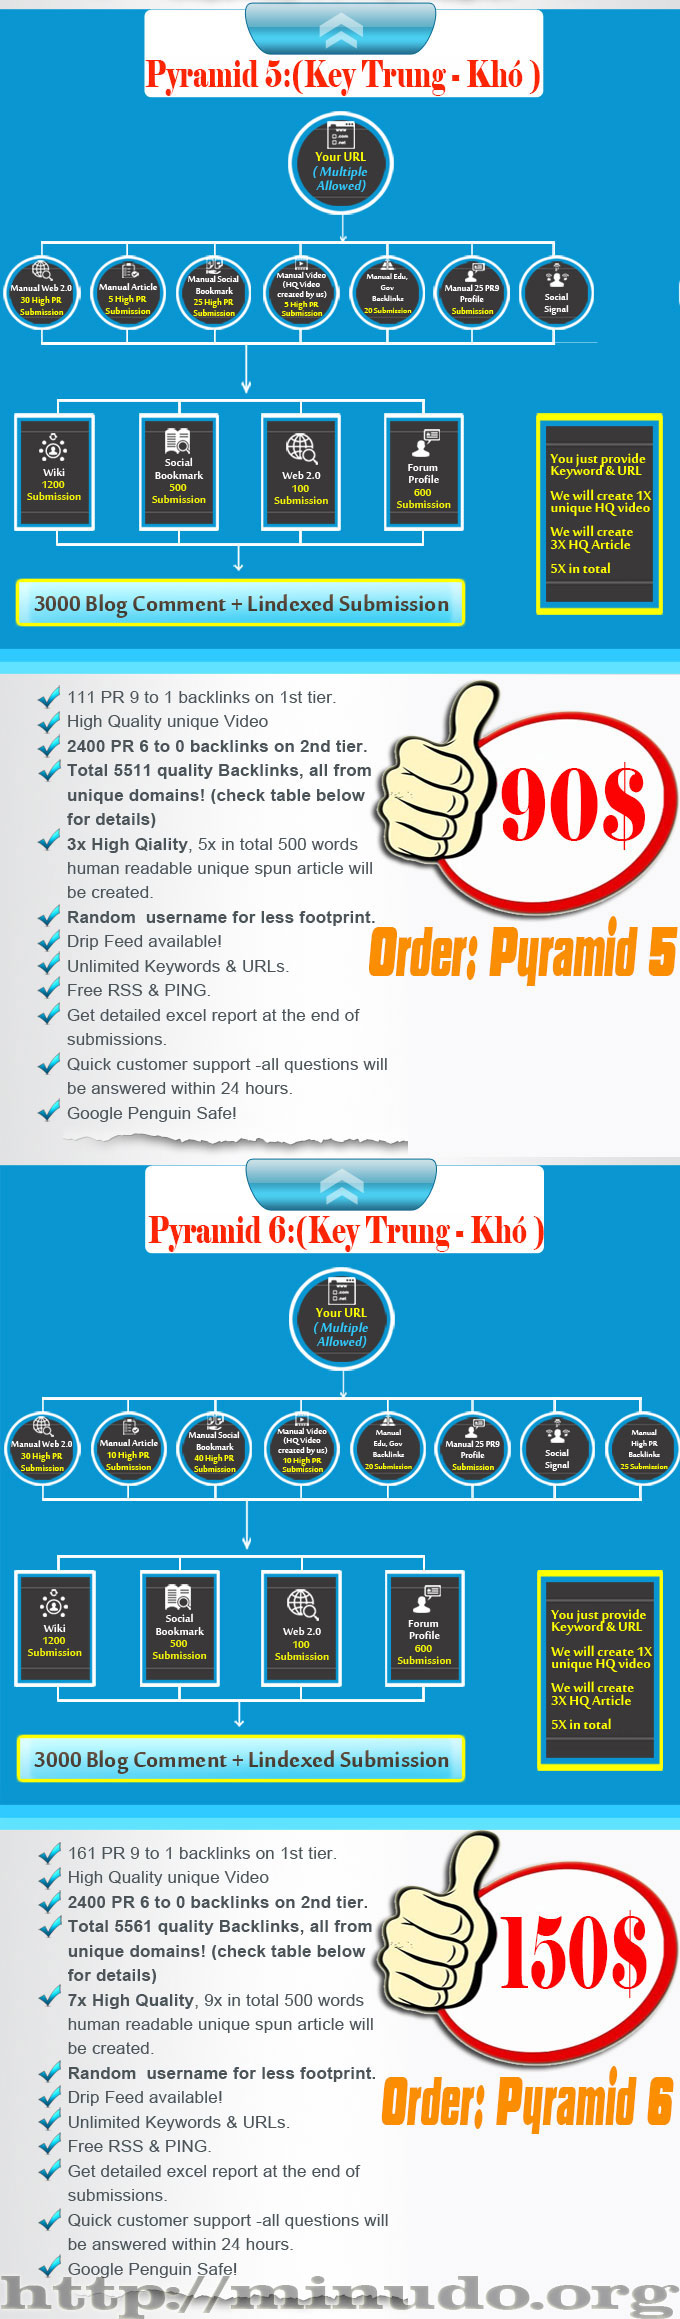 pyramid-5-6-minudo-org